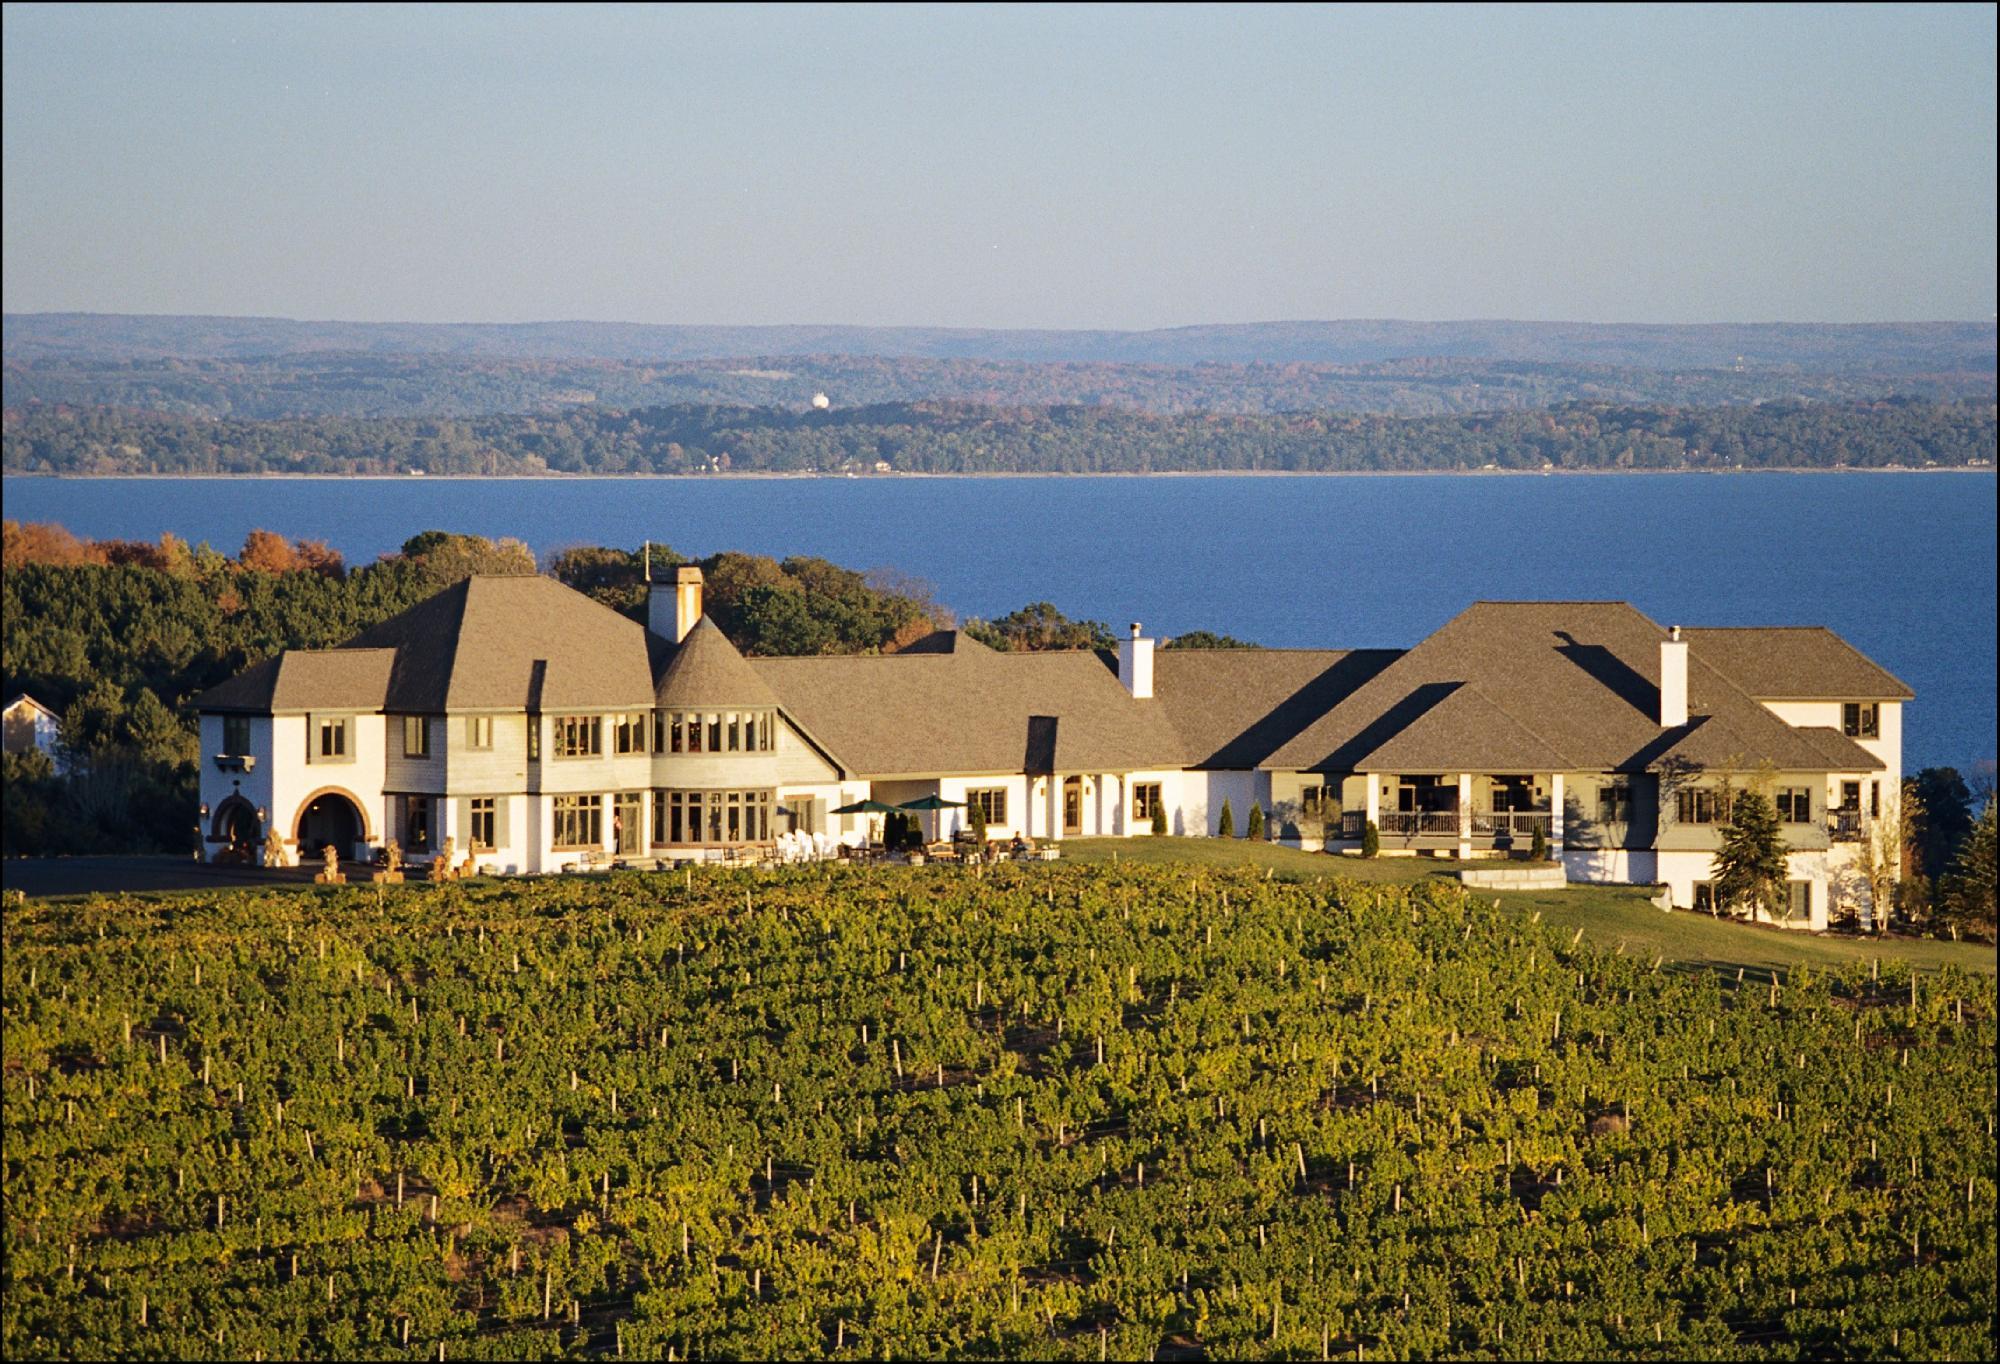 Chateau Chantal Winery and Inn